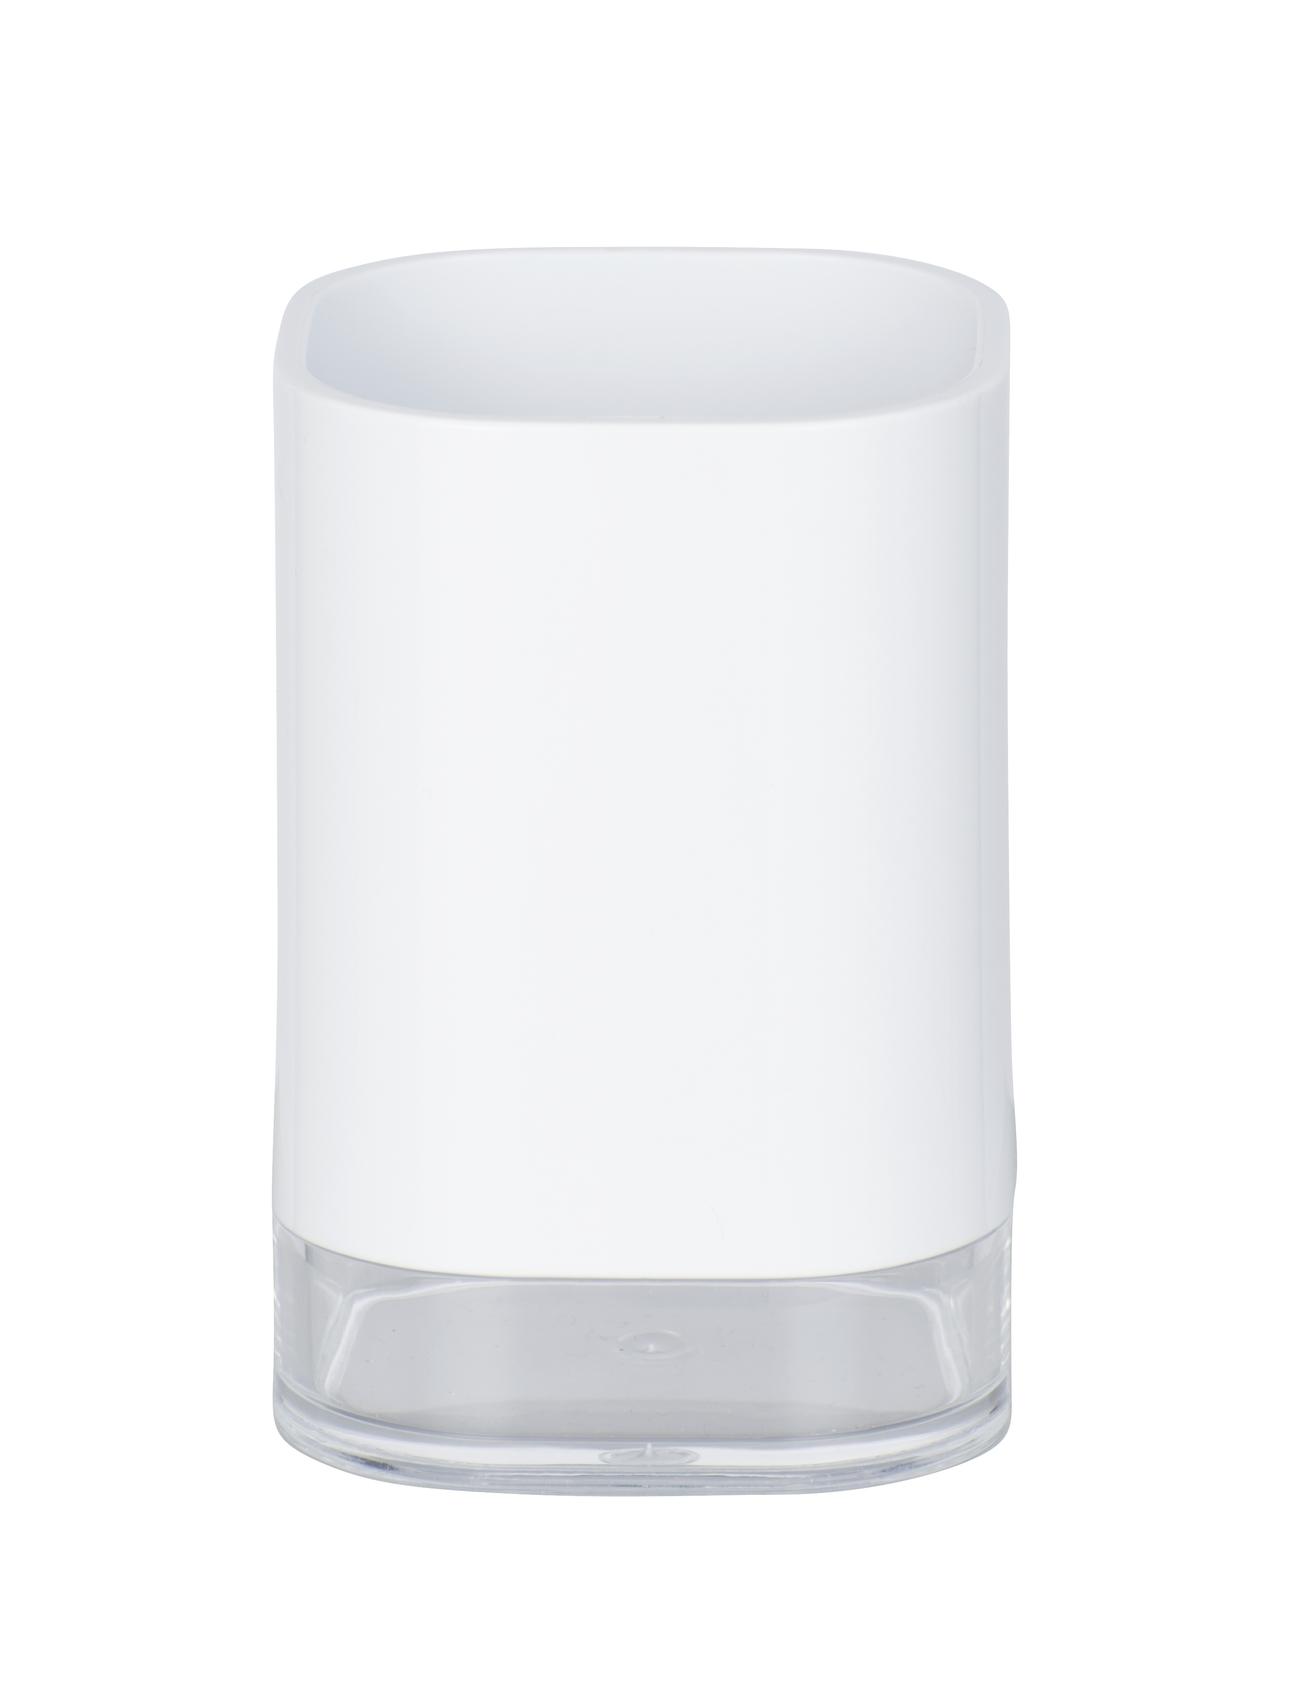 Pahar pentru periuta de dinti, din acril Oria Alb, L7,5xl7,5xH11,5 cm poza